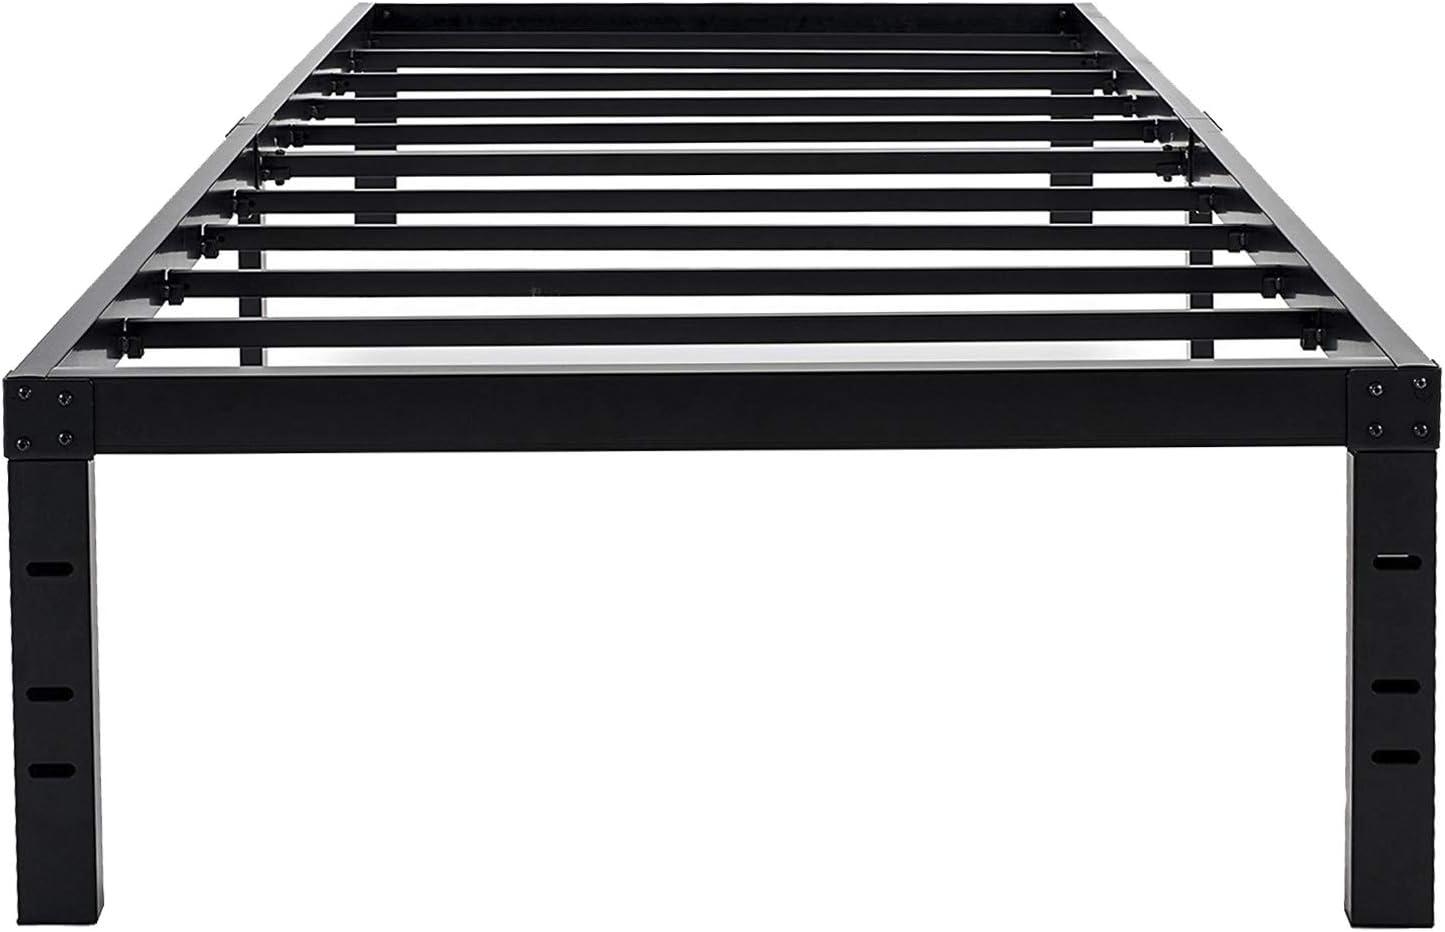 18 Inch Maximum Storage Bed Frame//Reinforced Platform //3500lbs Heavy Queen